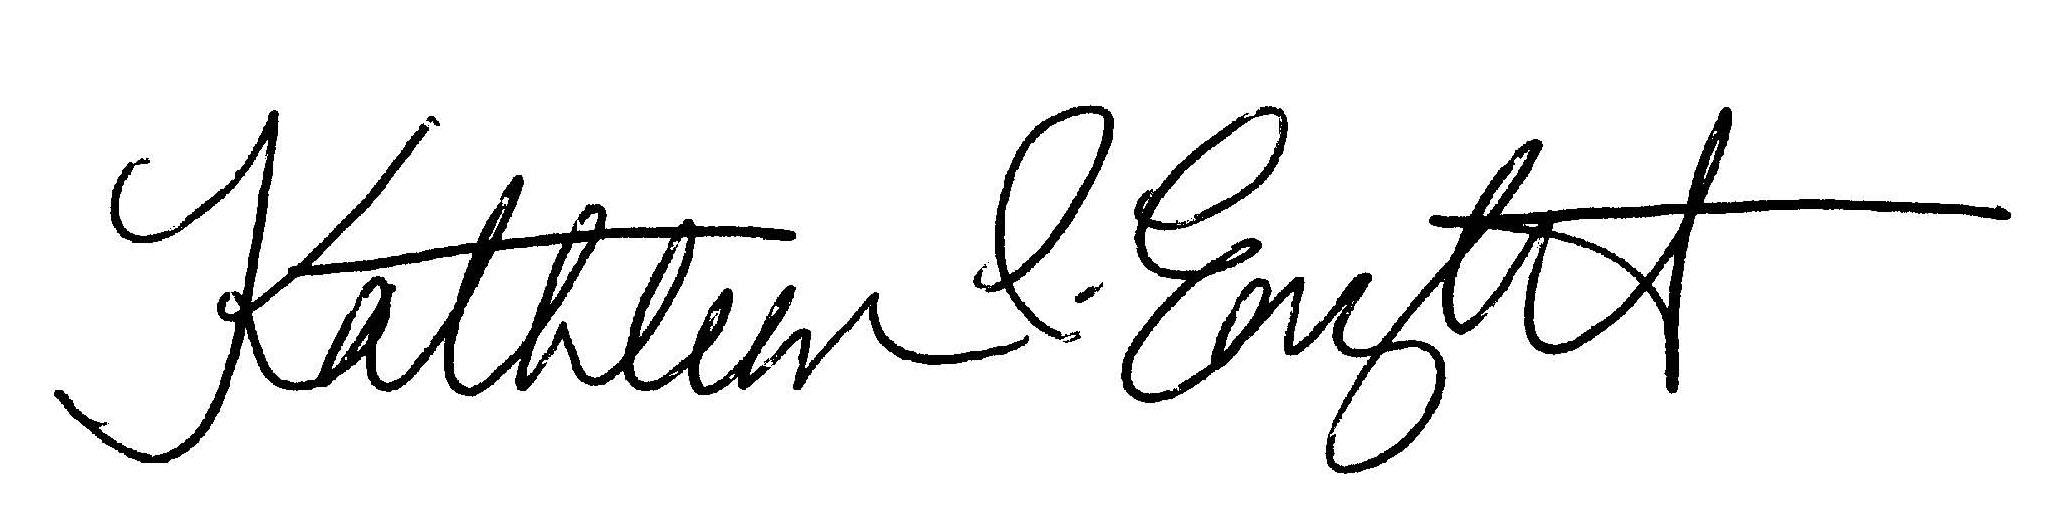 Signature_Kathleen Enright